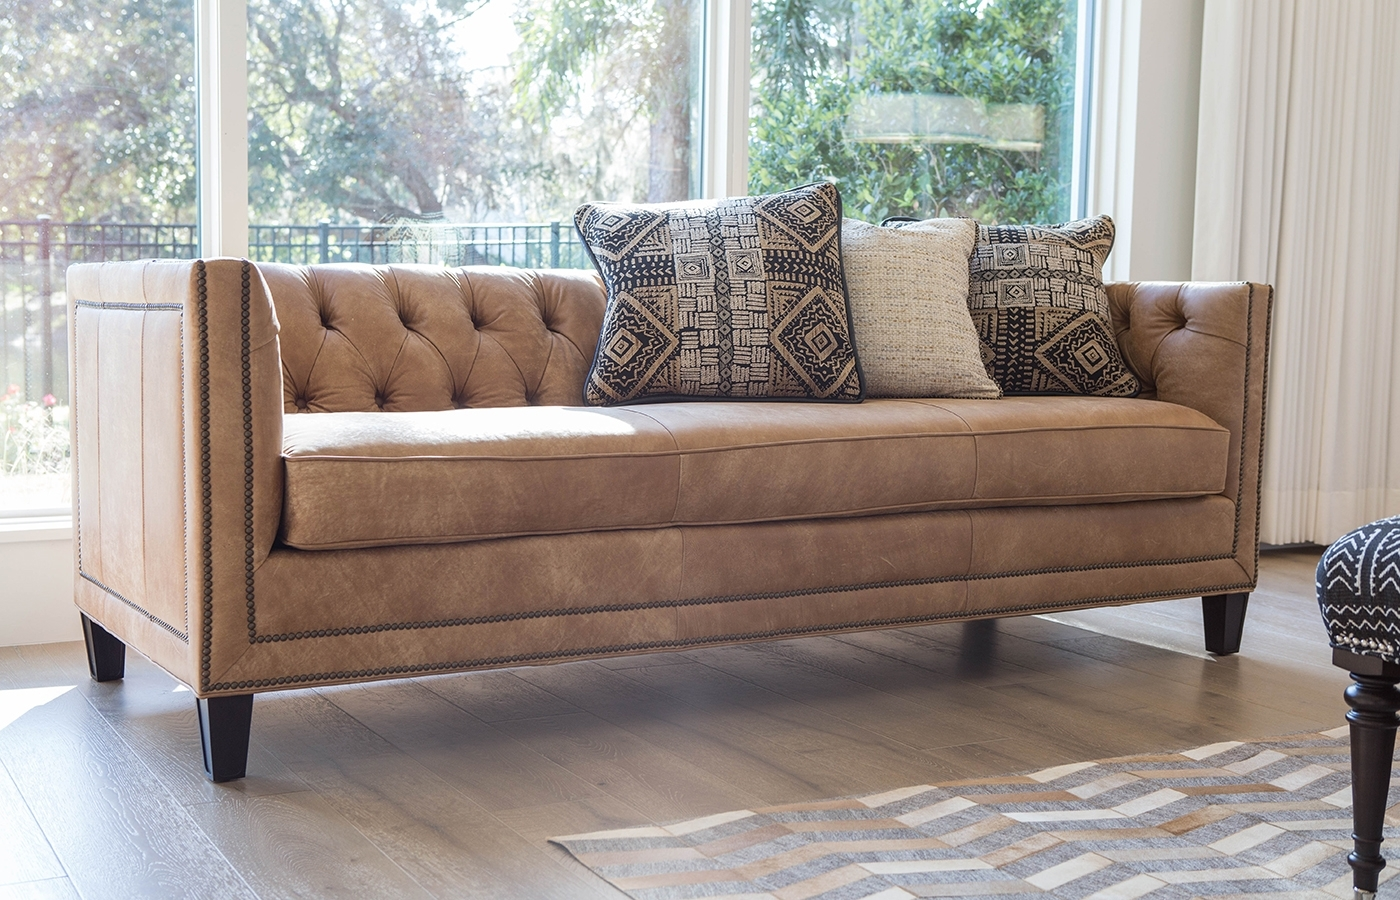 Fashionable Norwalk Sofas In Norwalk Furniture (View 6 of 20)